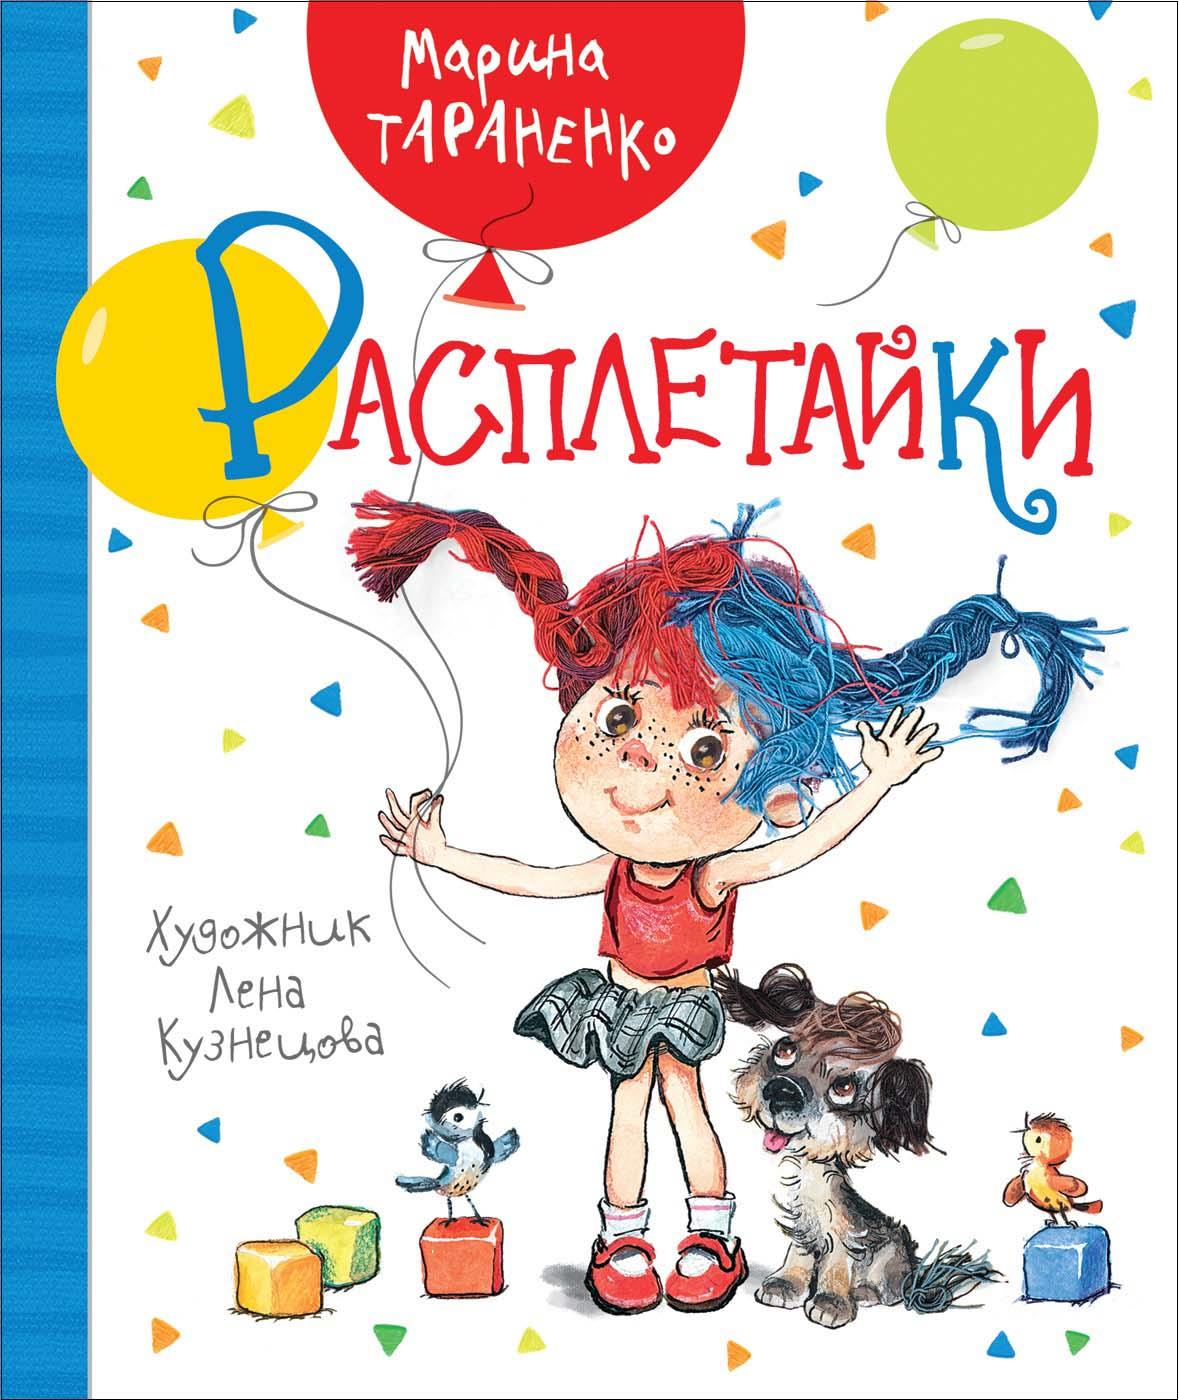 Книга - Расплетайки, Тараненко М.